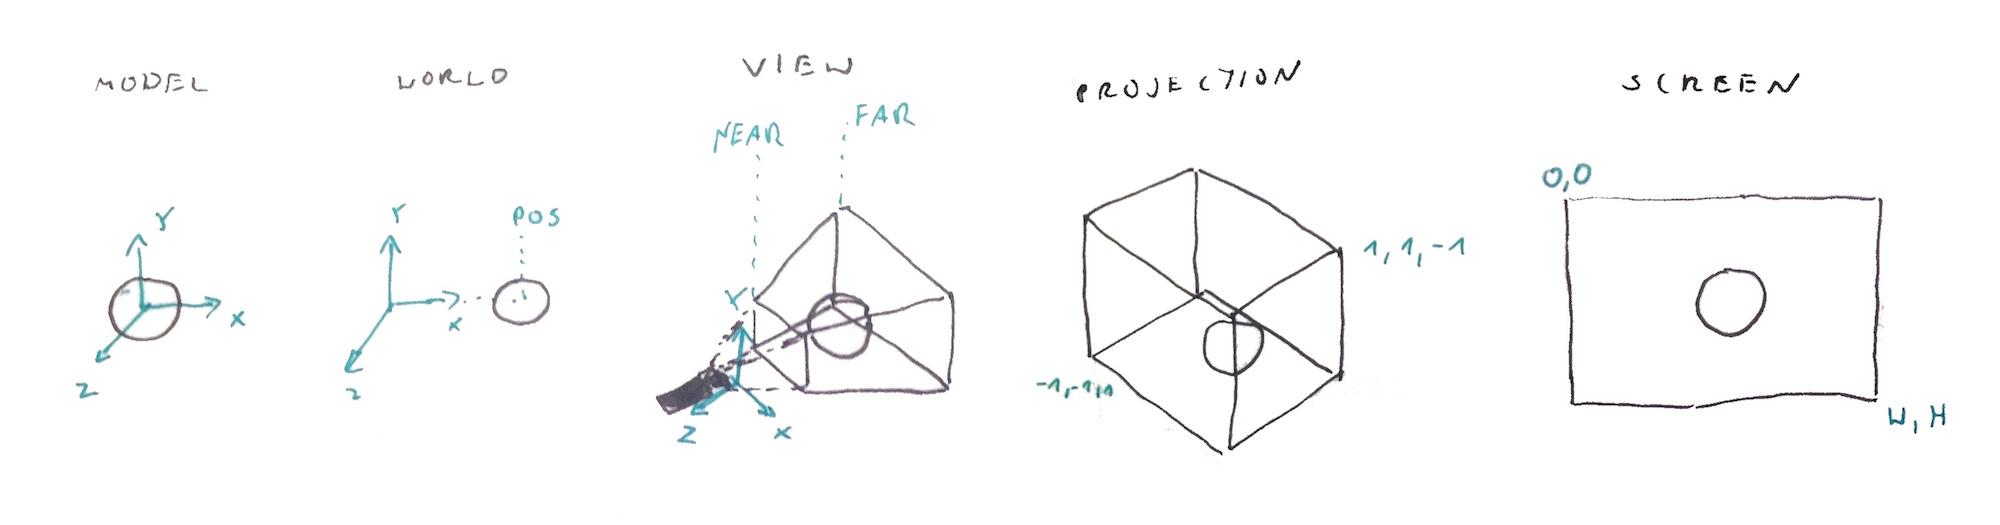 Marcin Ignac : Pragmatic physically based rendering : Setup